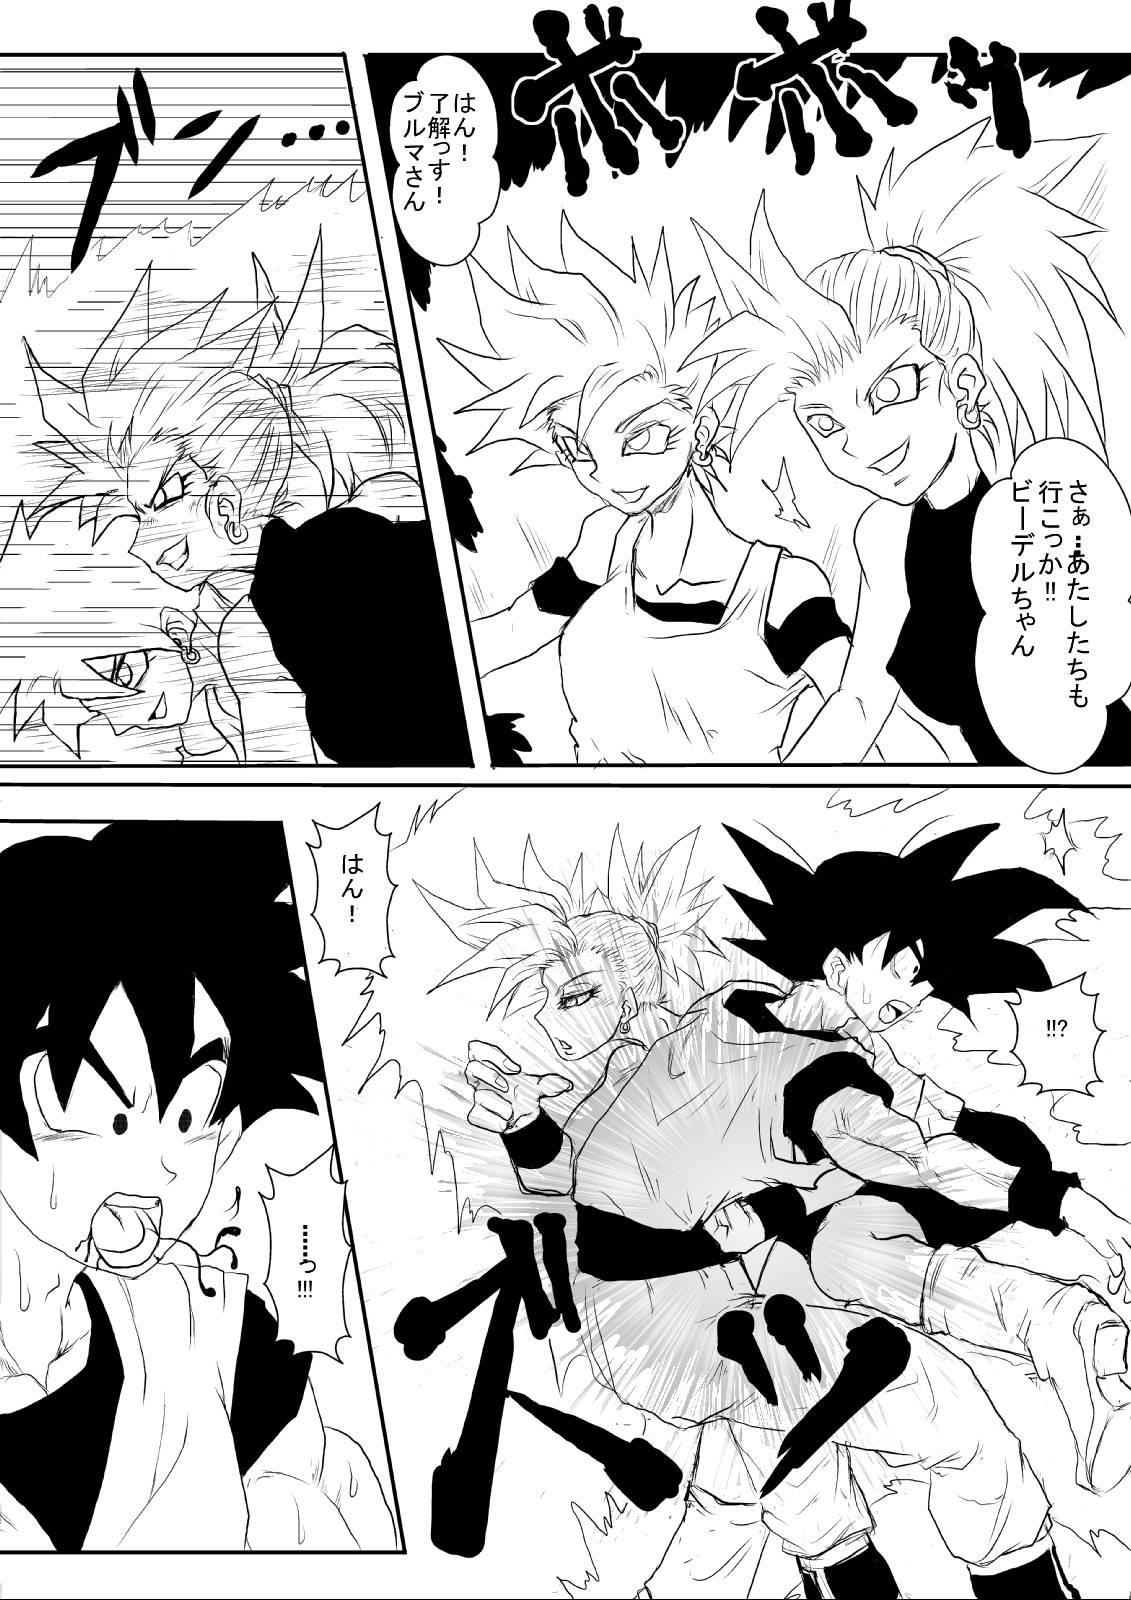 [Alice.Blood] Sennou Kyouiku-shitsu~ Jinzou ☆-kan 18-gou-hen (Dragon Ball Z) 3